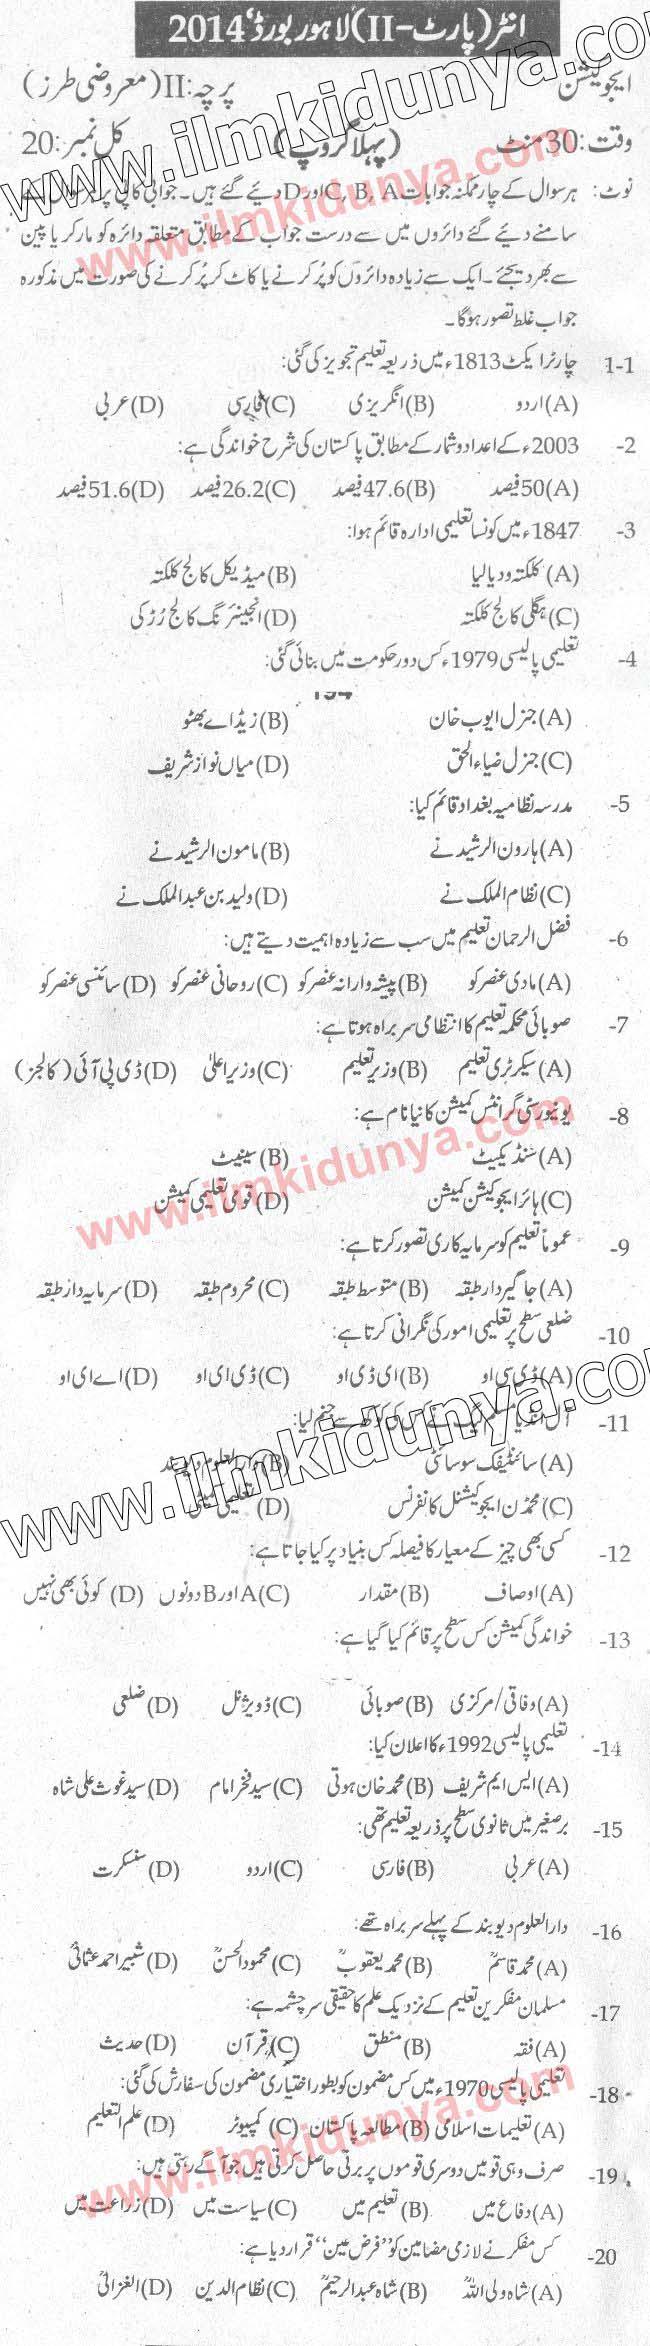 Past Papers 2014 Lahore Board Inter Part 2 Education Urdu